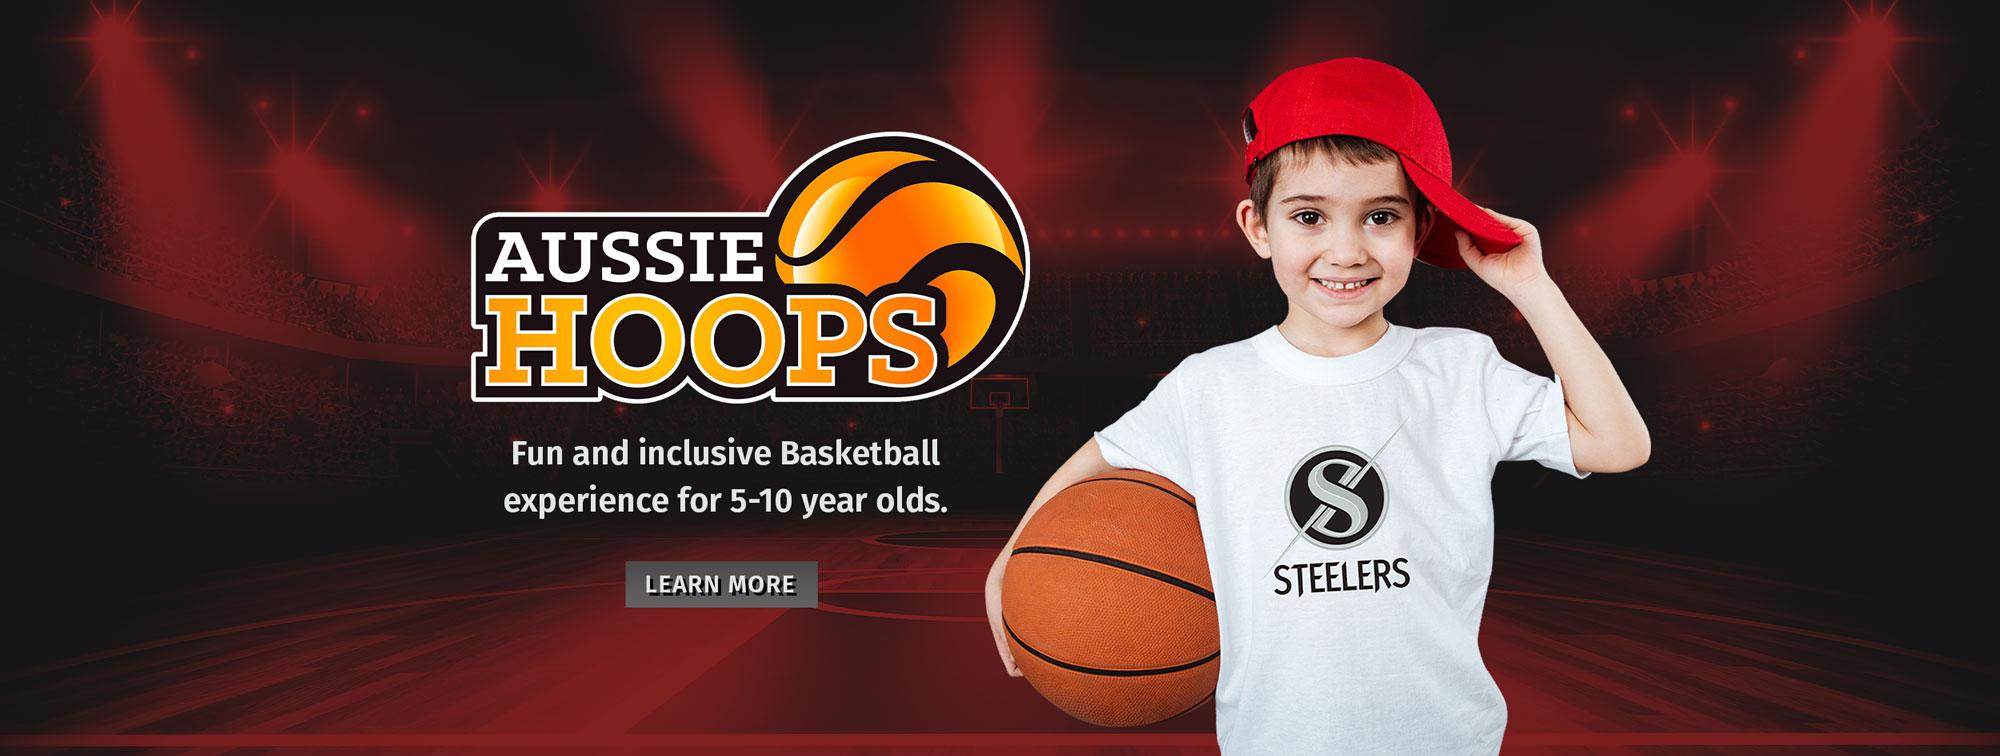 Aussie Hoops | Kids Basketball | Childrens basketball | Junior Basketball | WPBA | Westernport Basketball Association | Western Port Basketball Association | Mornington Peninsula